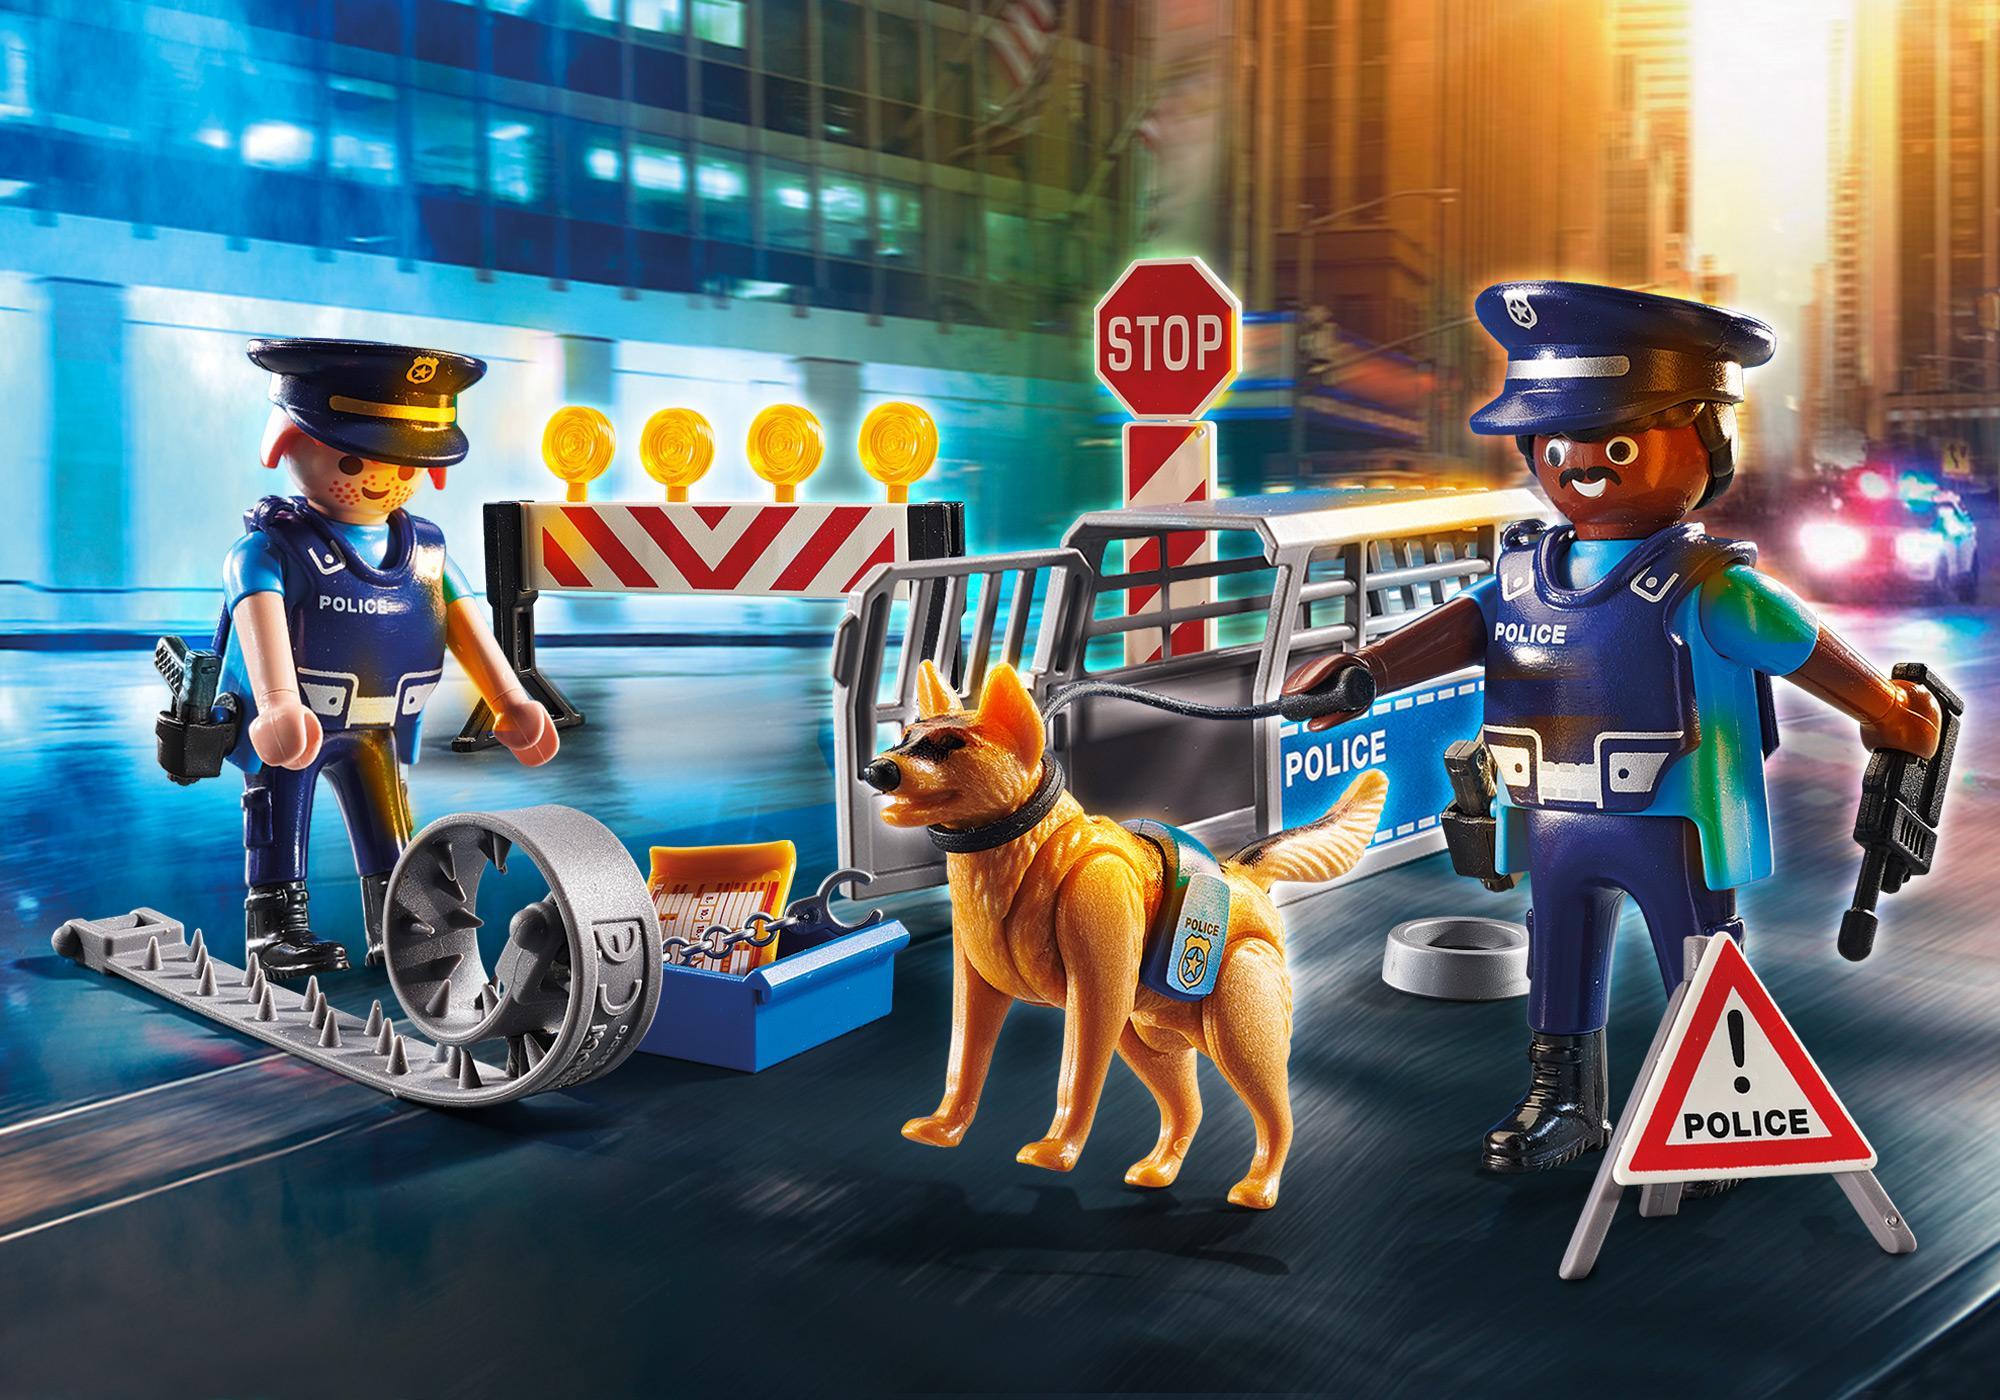 http://media.playmobil.com/i/playmobil/6924_product_detail/Blokada policyjna